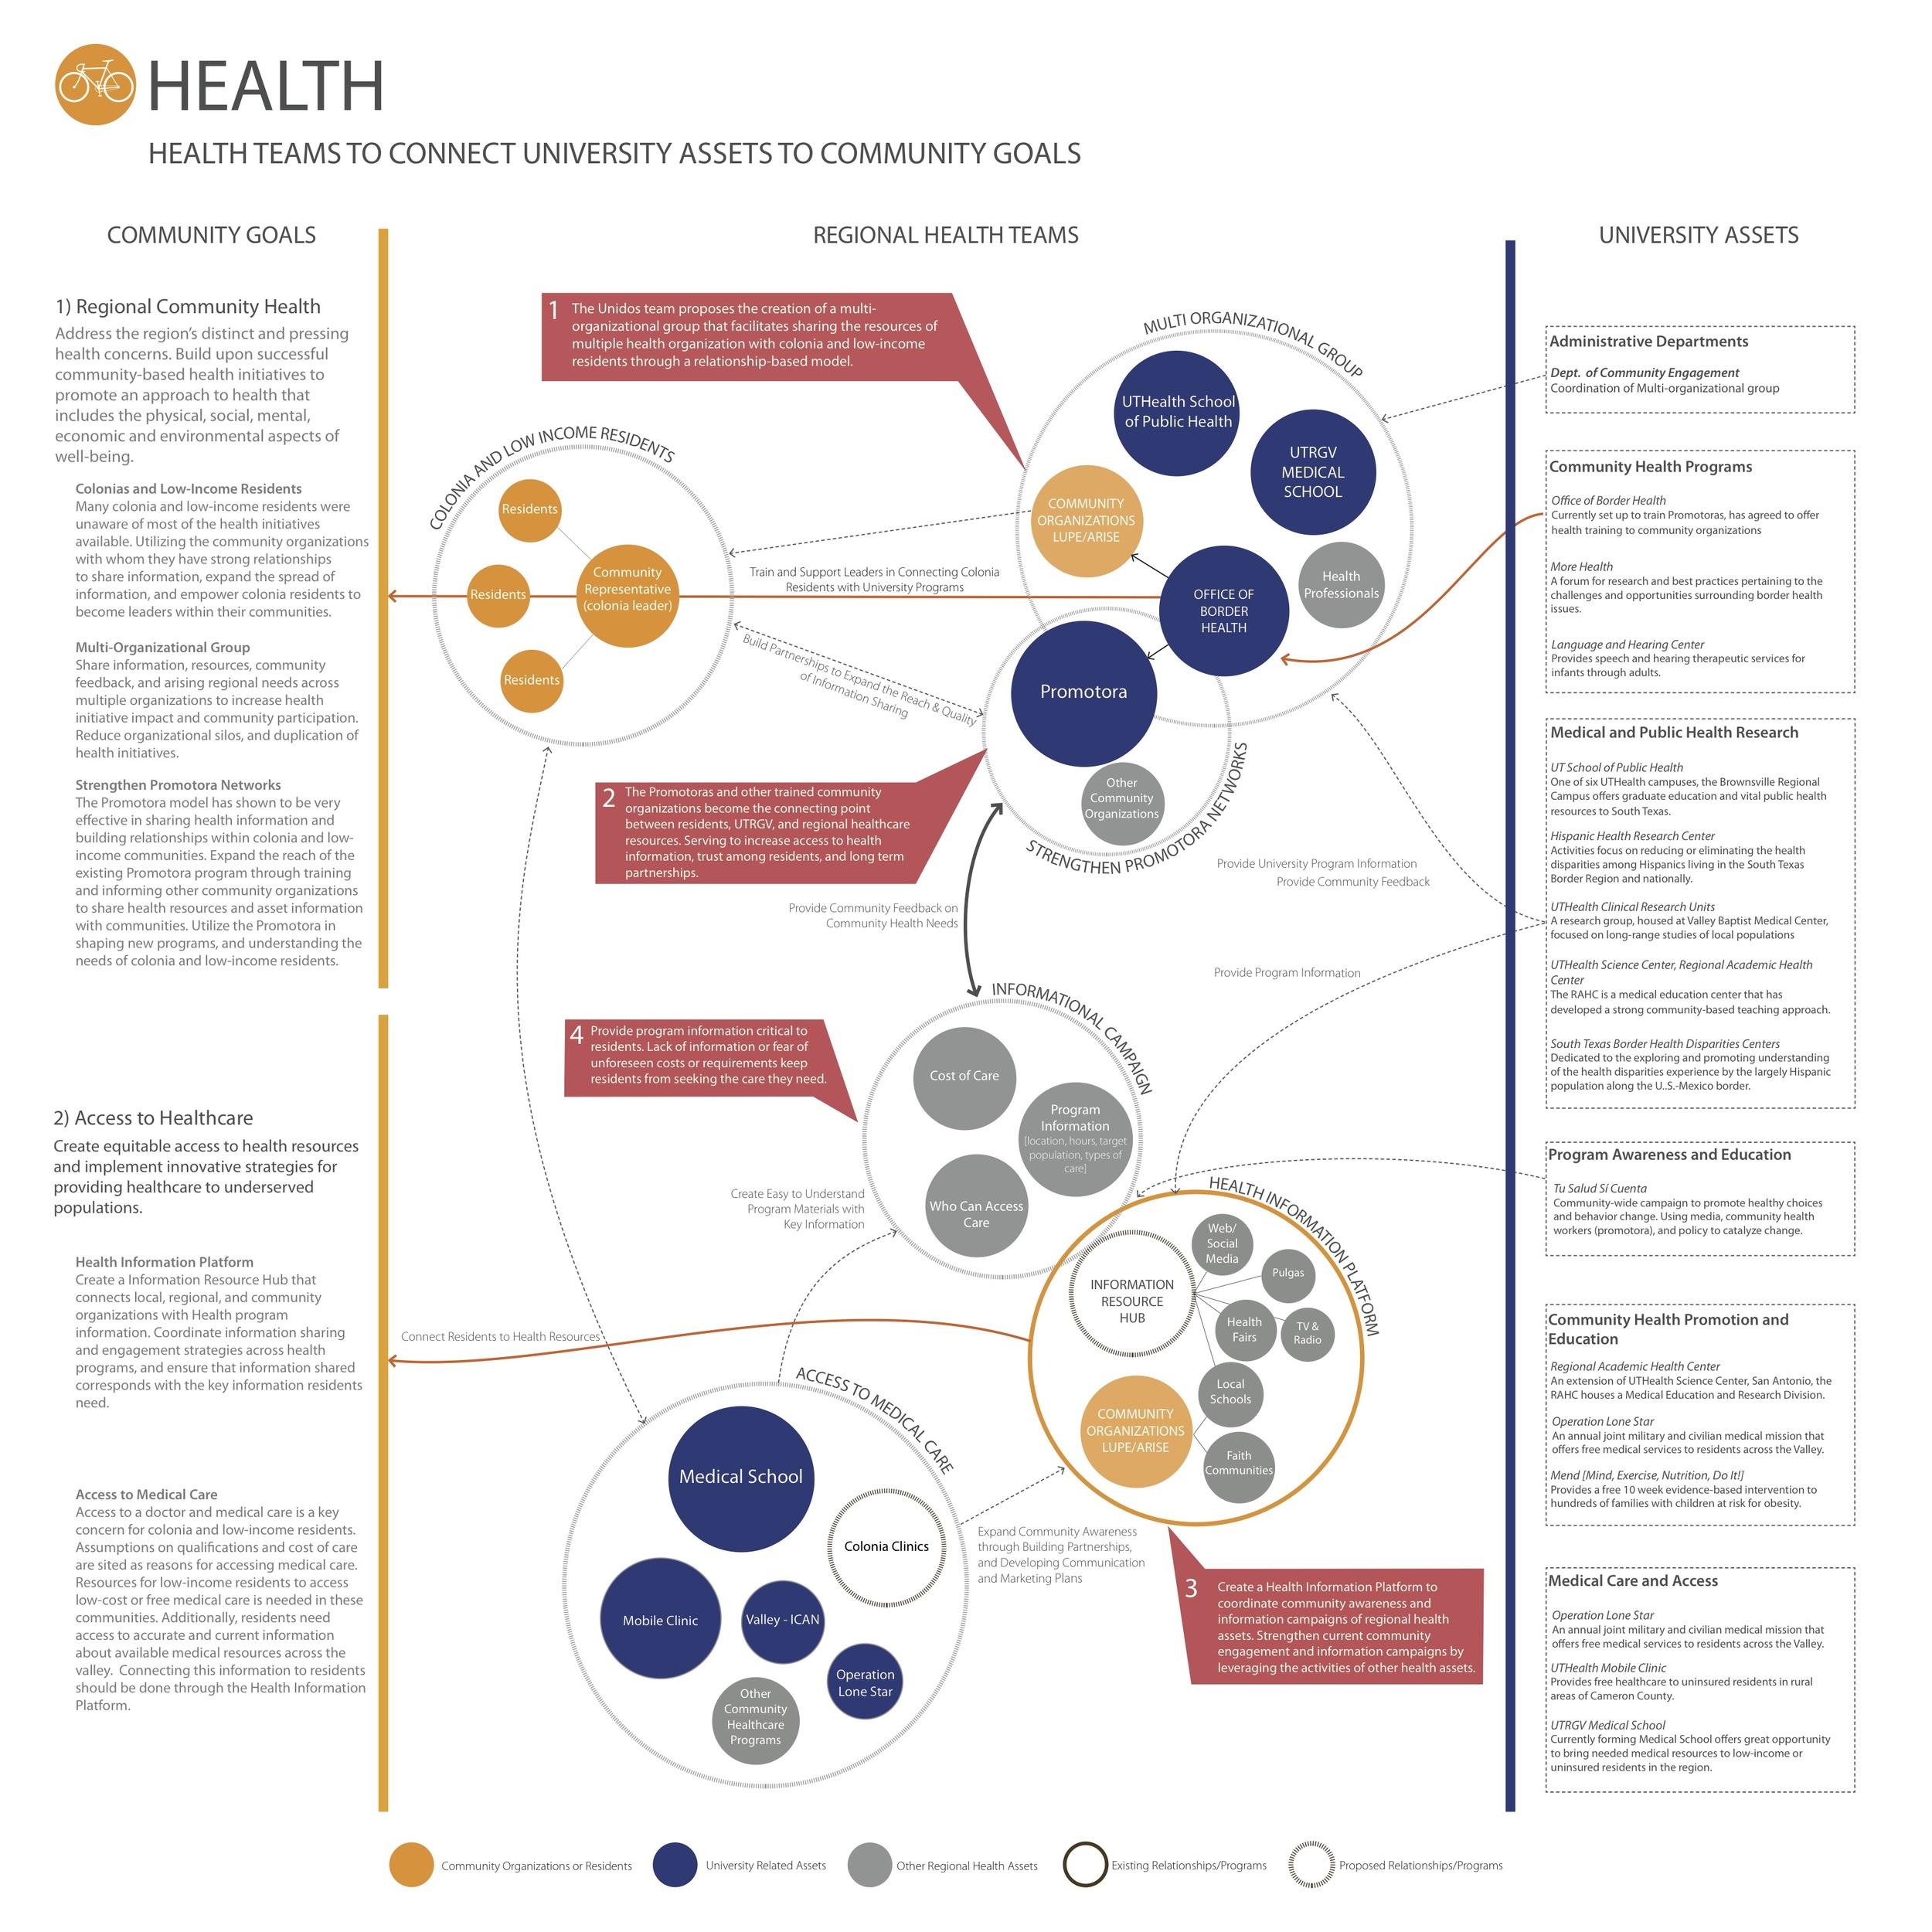 UTRGV_Health_ASSETMAP_20150415_ENGLISH.jpg